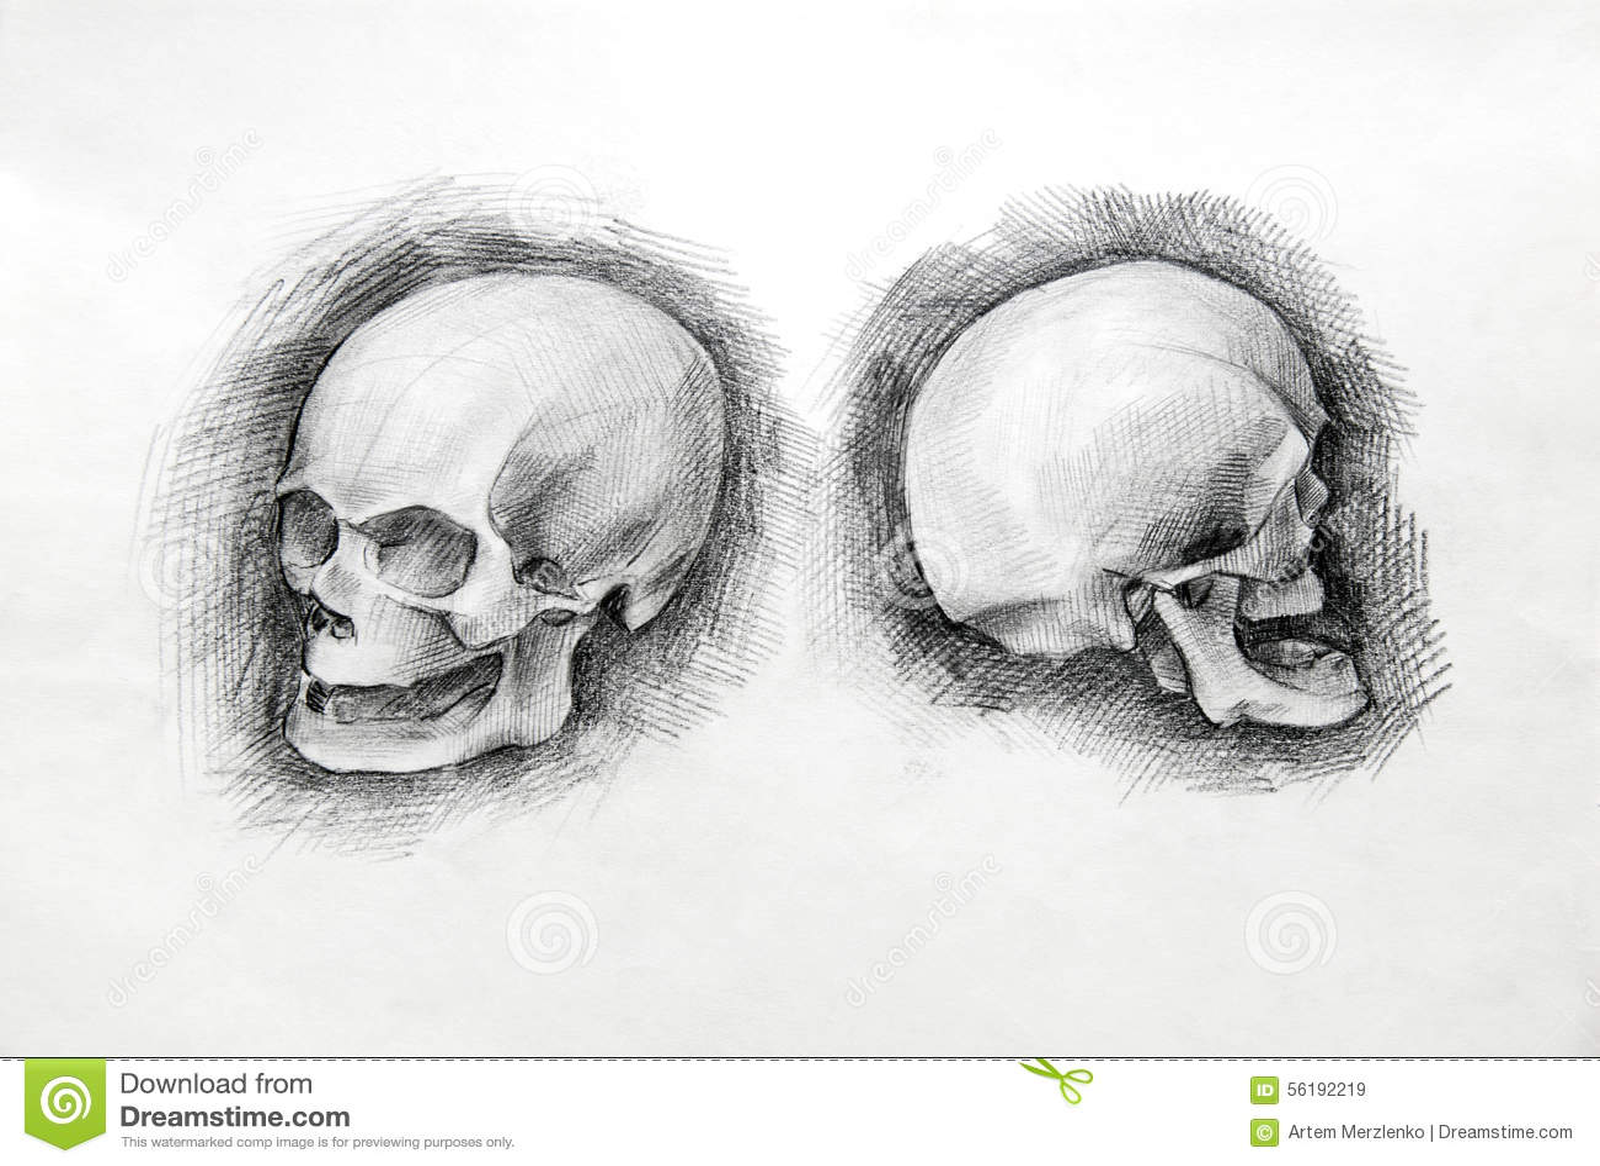 Skull Study Drawing. Pencil On Paper. Stock Illustration ...